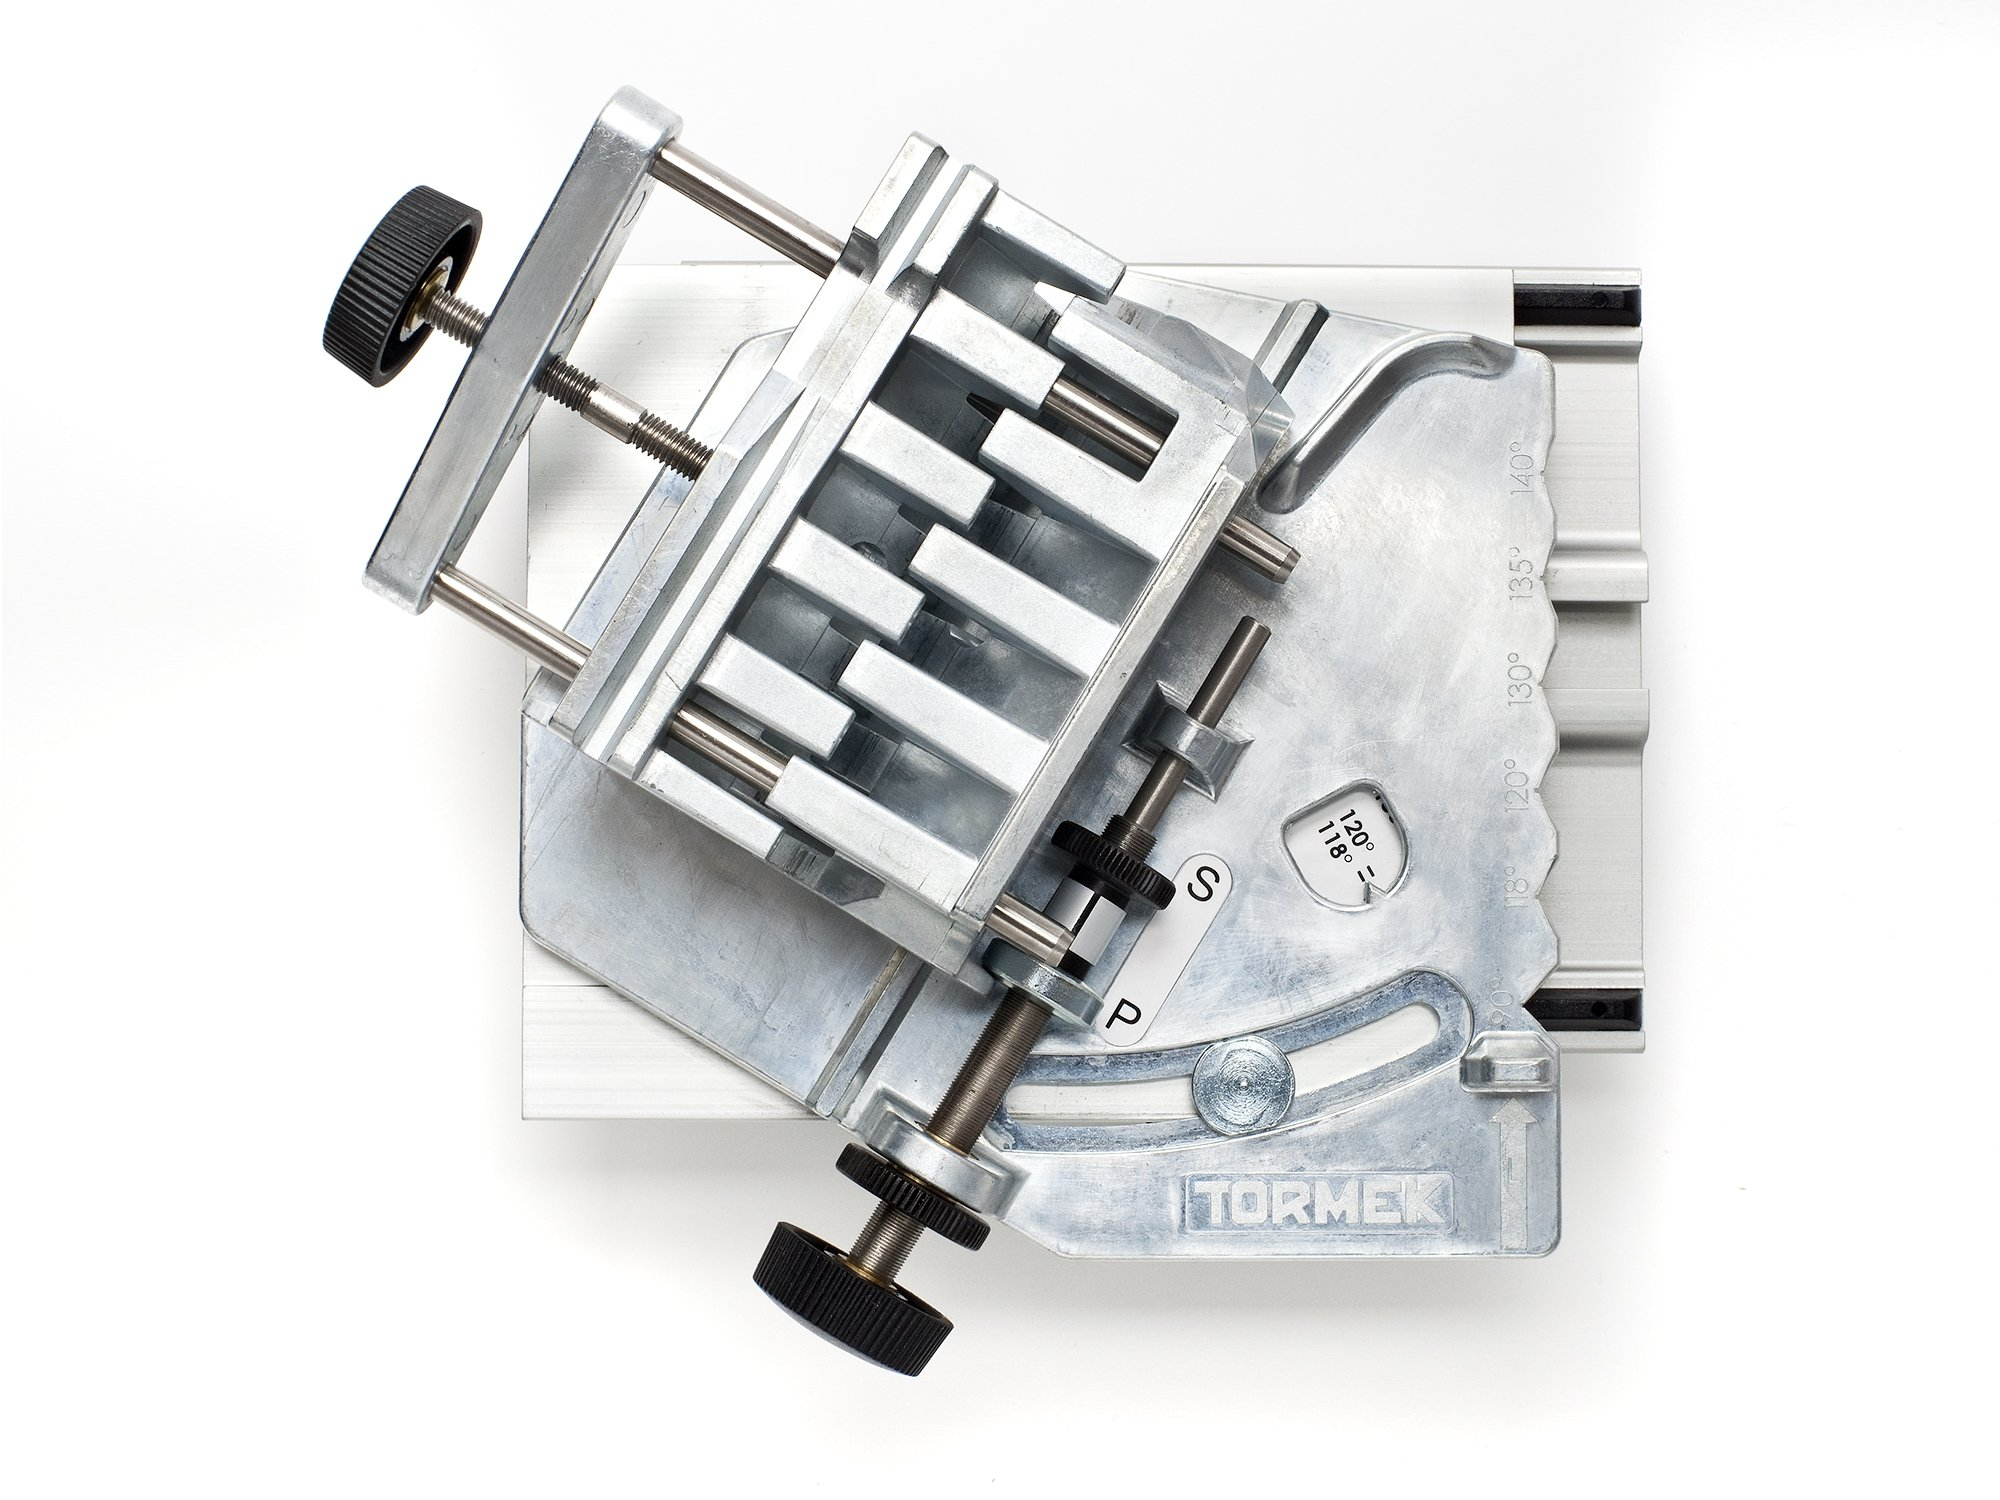 Drill Bit Sharpener Tormek DBS-22 - The Drill Bit Sharpening Jig Attachment For Tormek Water-Cooled Sharpening Systems.